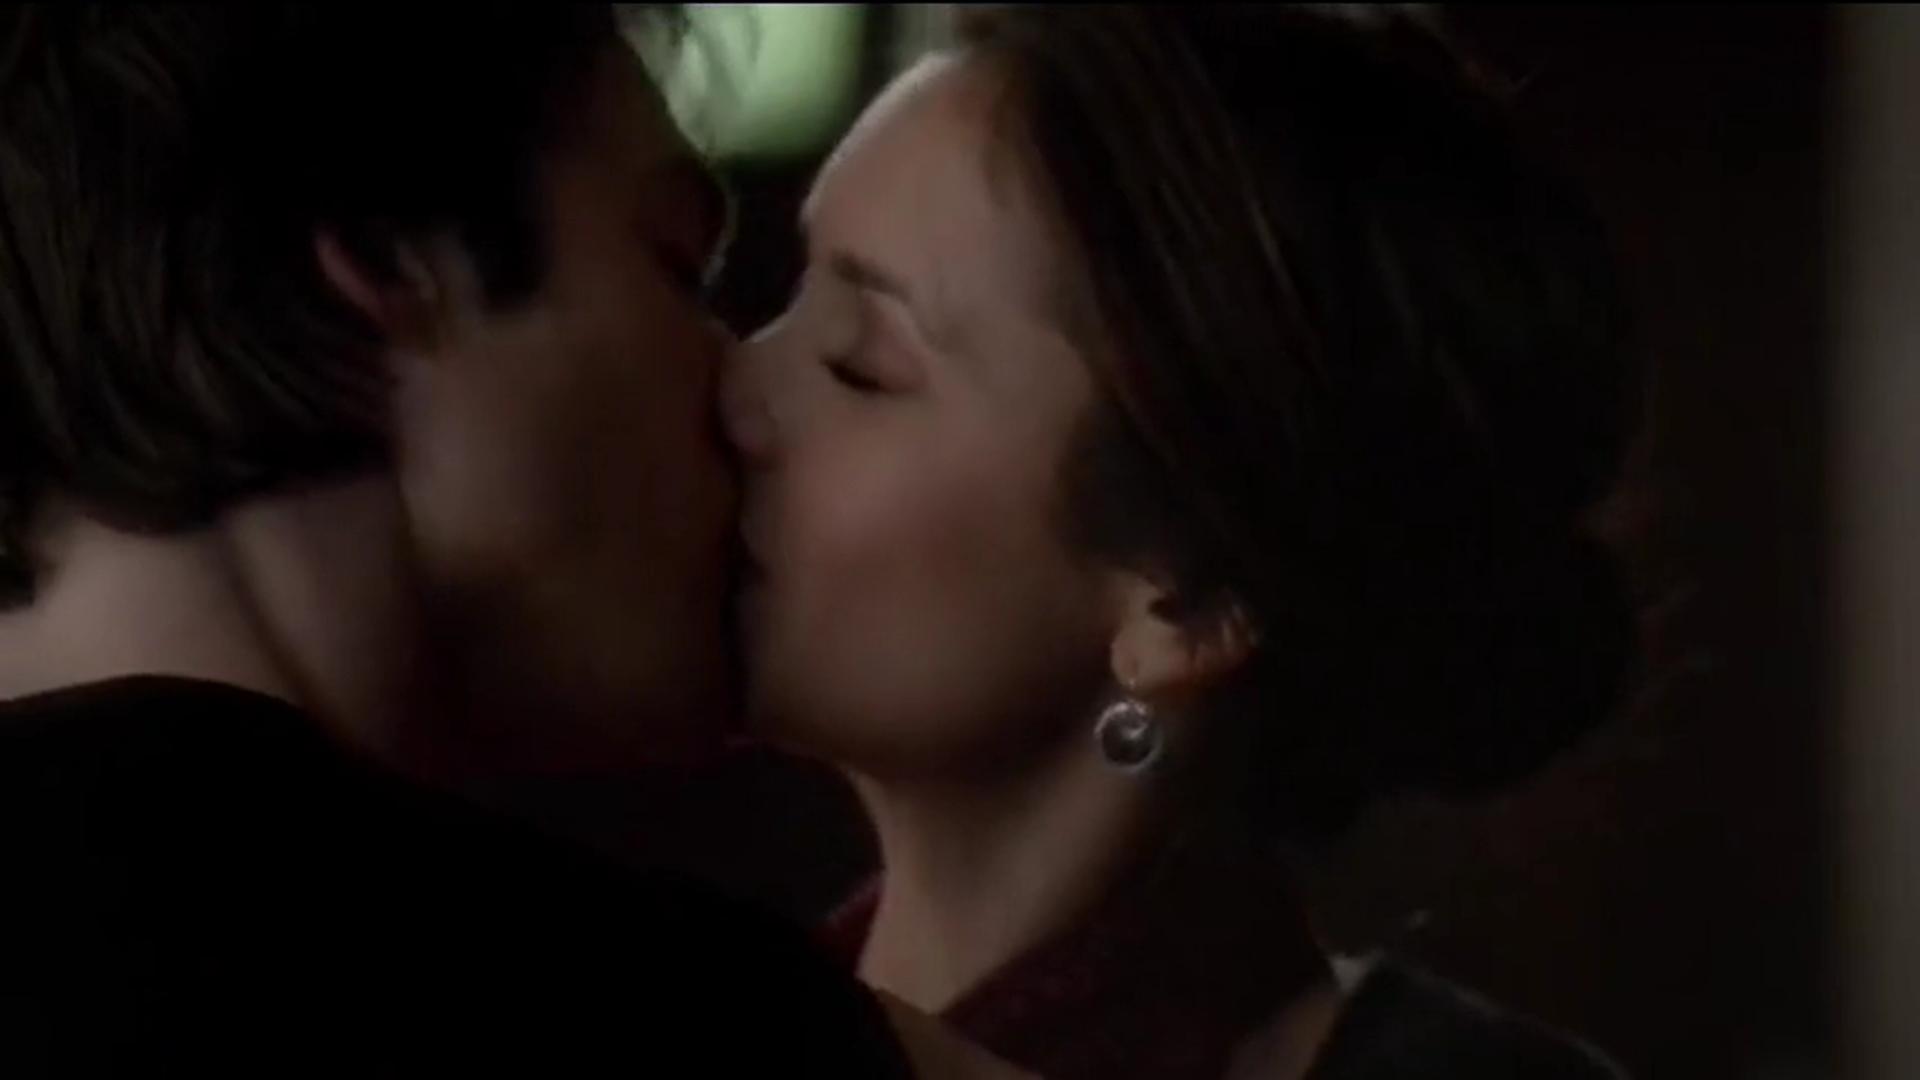 Vampire girl kiss video 3gp download fucks clips